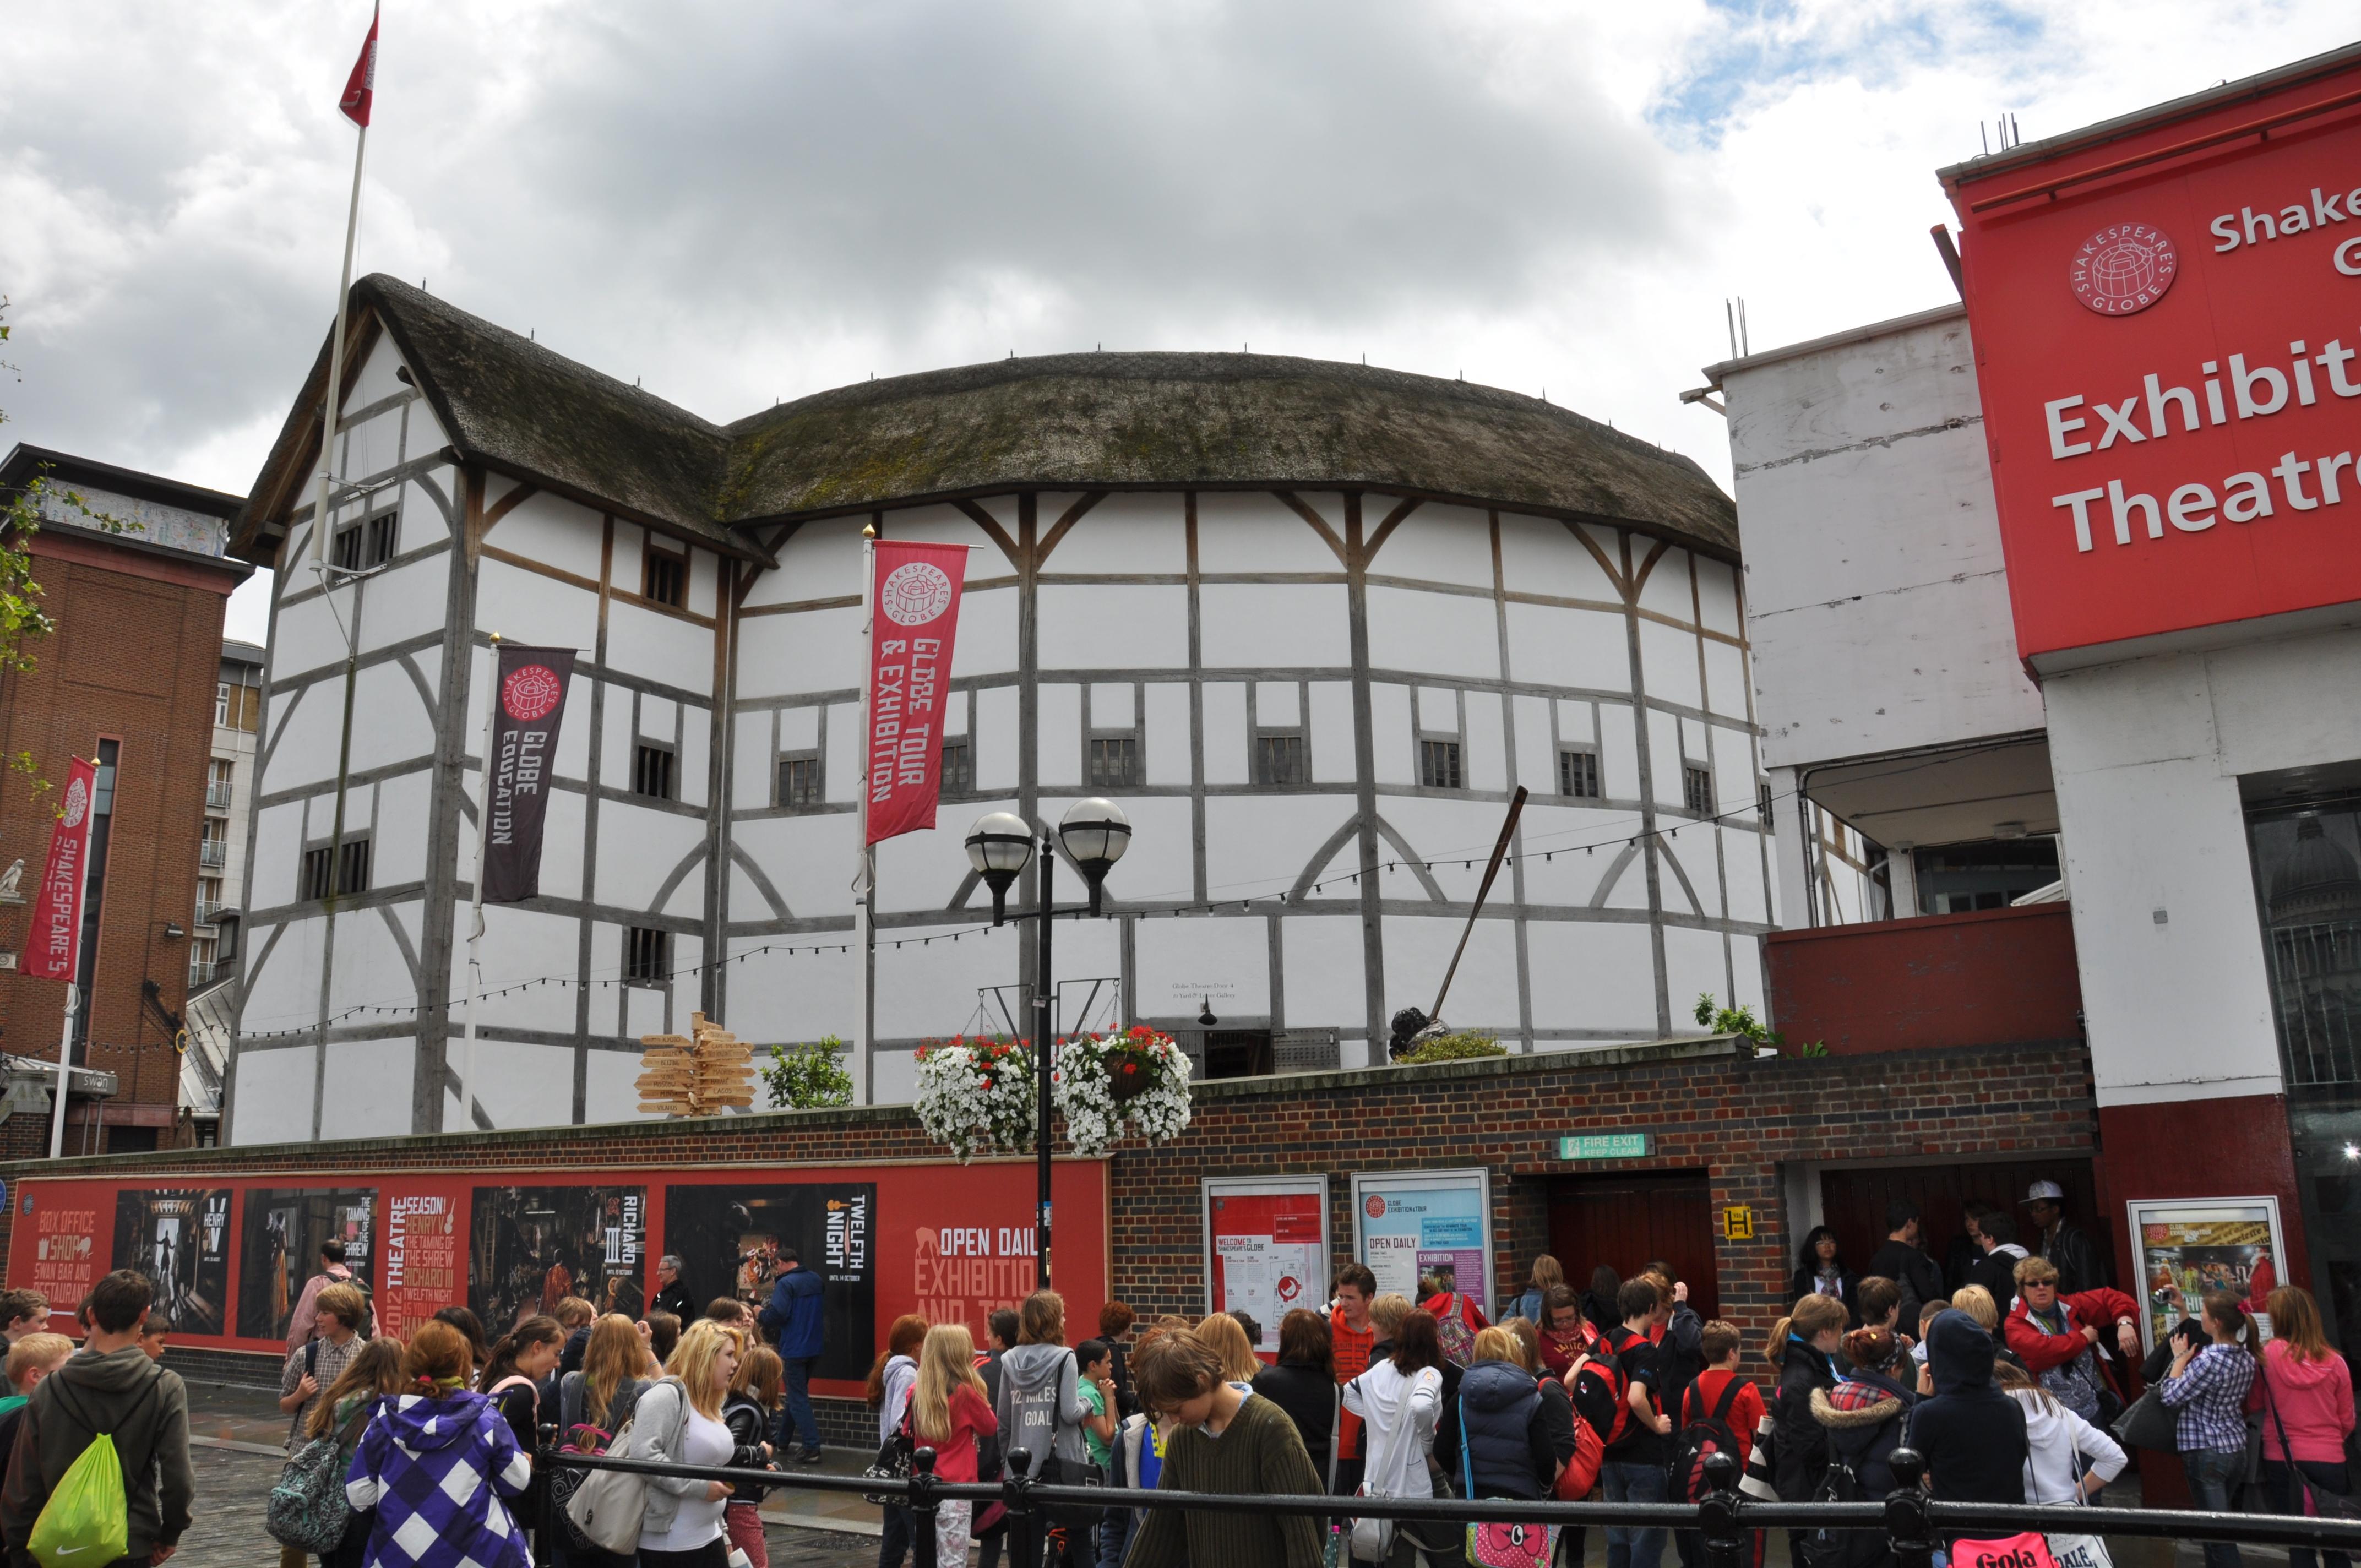 Shakespeares globe exhibition and tour teatro globe exposicin tour destacado malvernweather Image collections